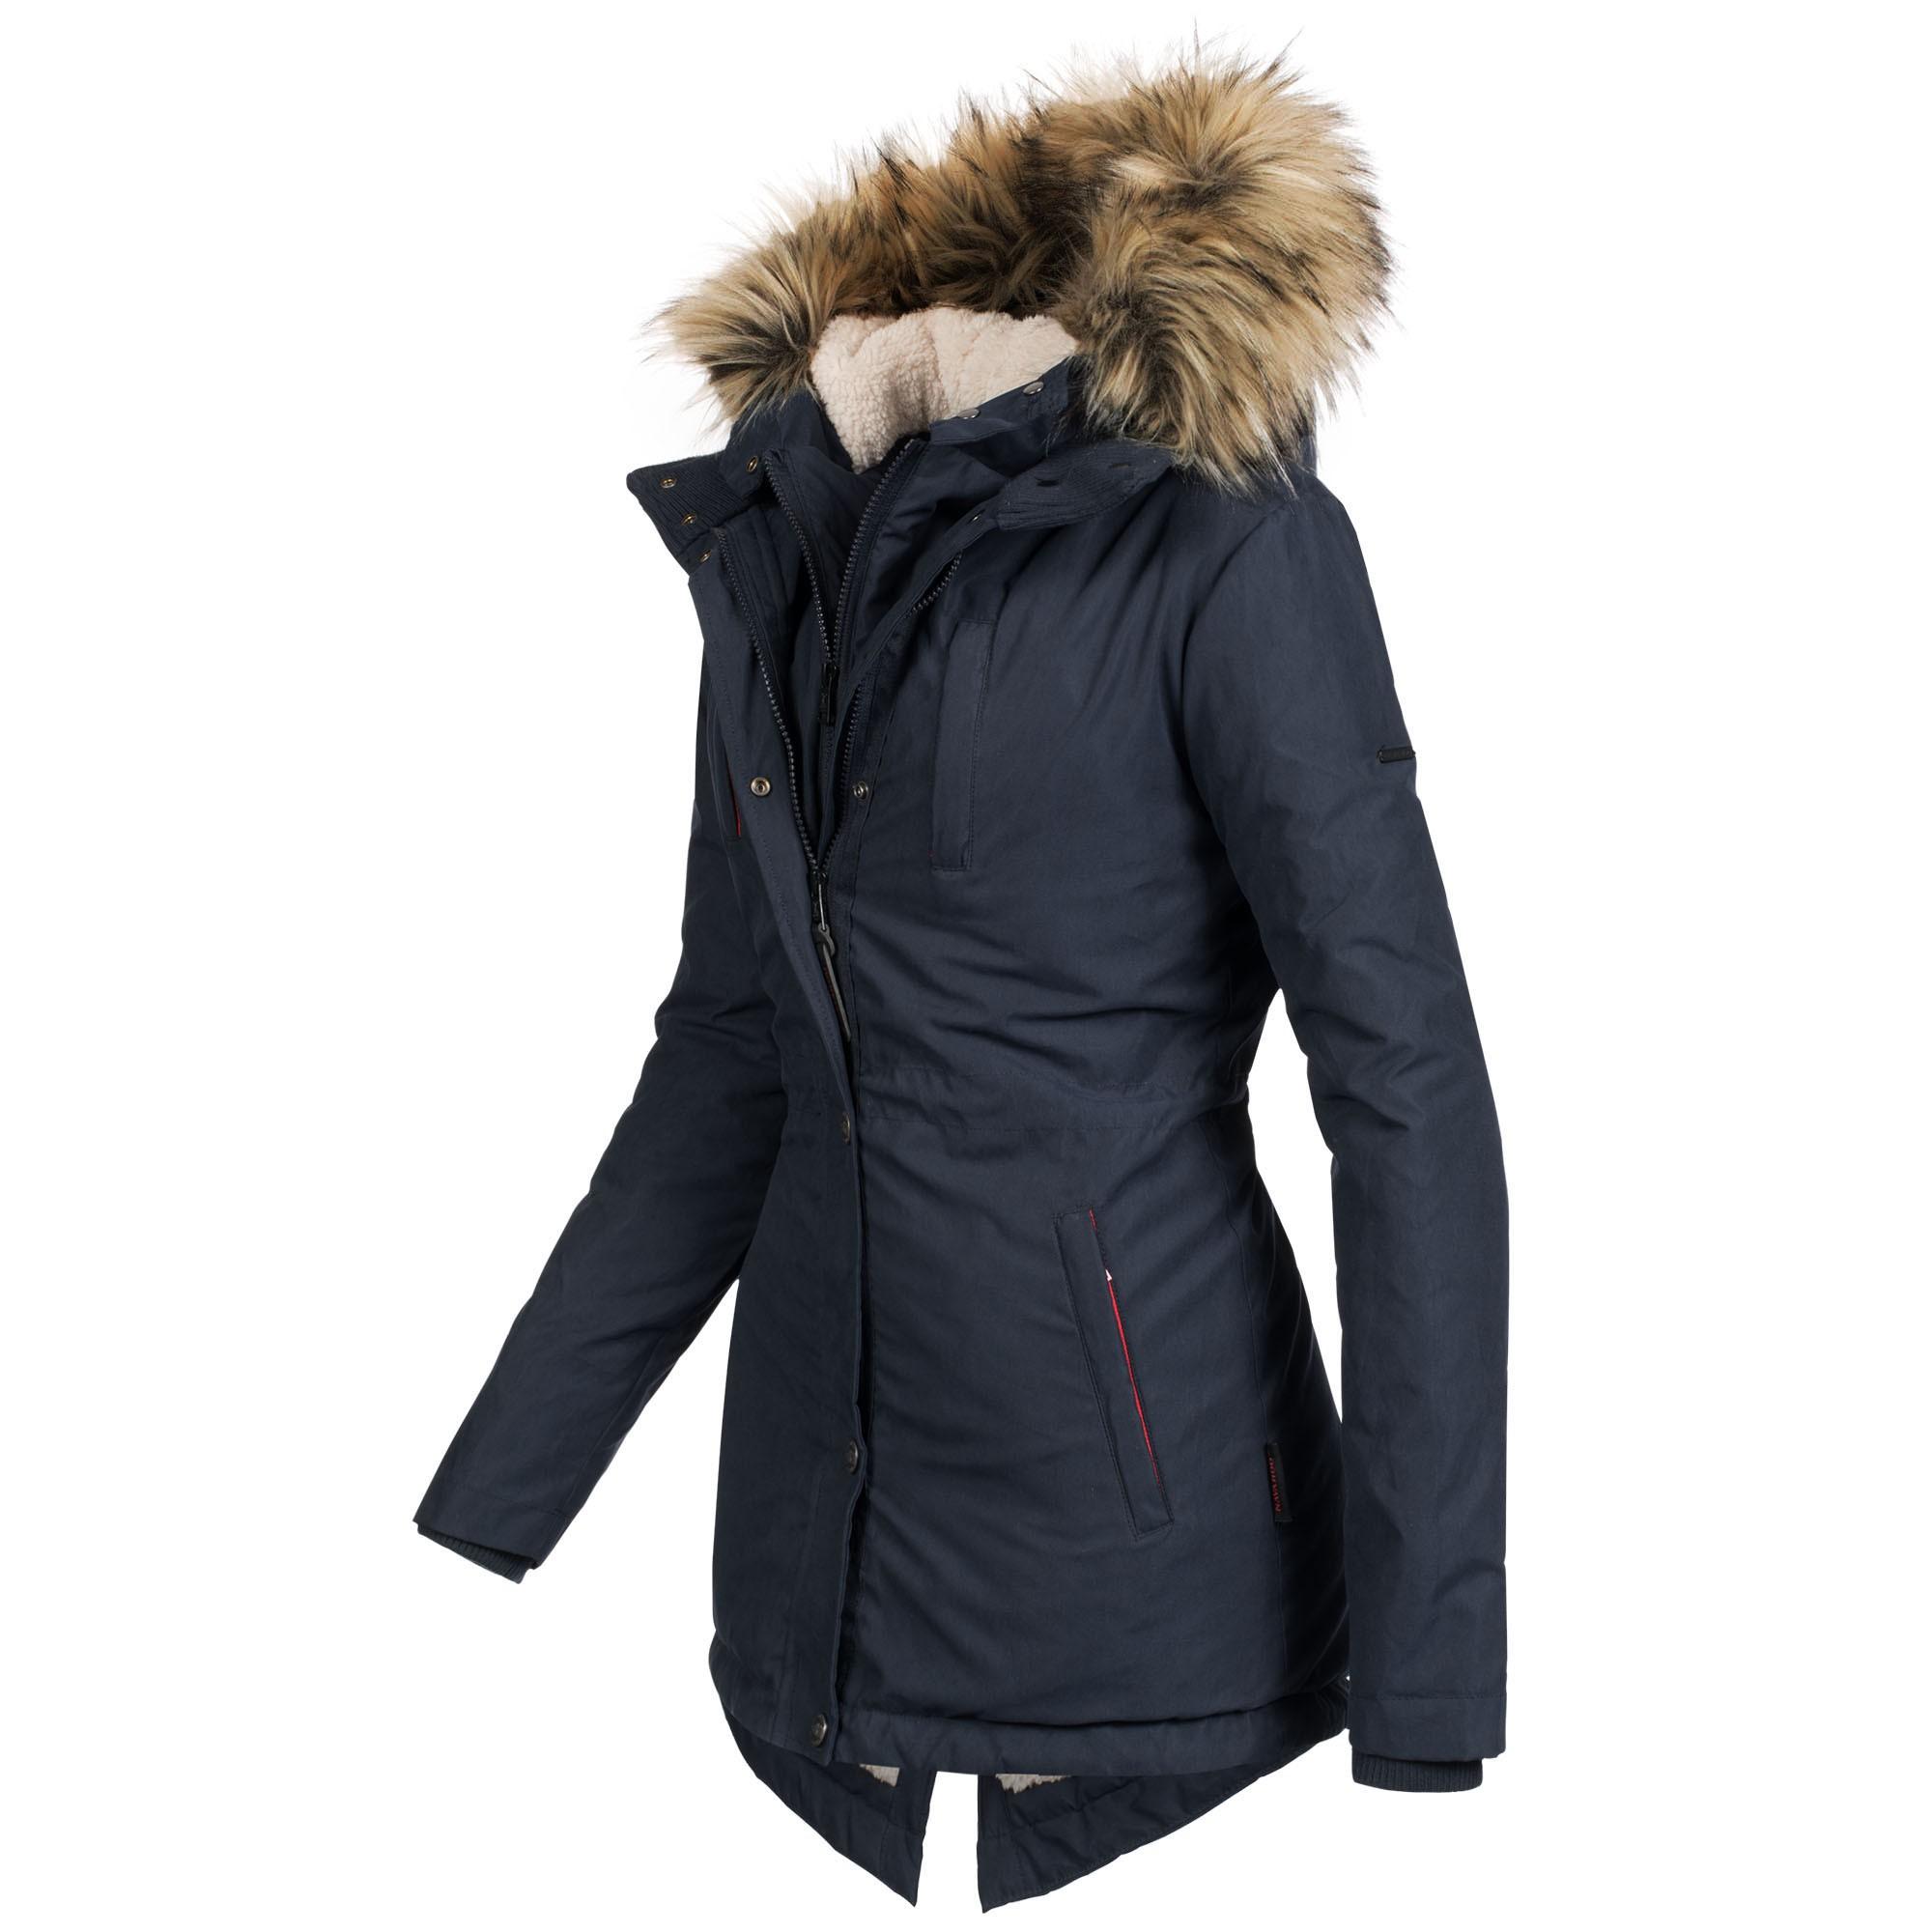 Marikoo Akira Damen Mantel Jacke Parka Winterjacke Warm Gefttert Navy M Doublezipper Xs Xxl 5farben Ausnahme Zustand Shop